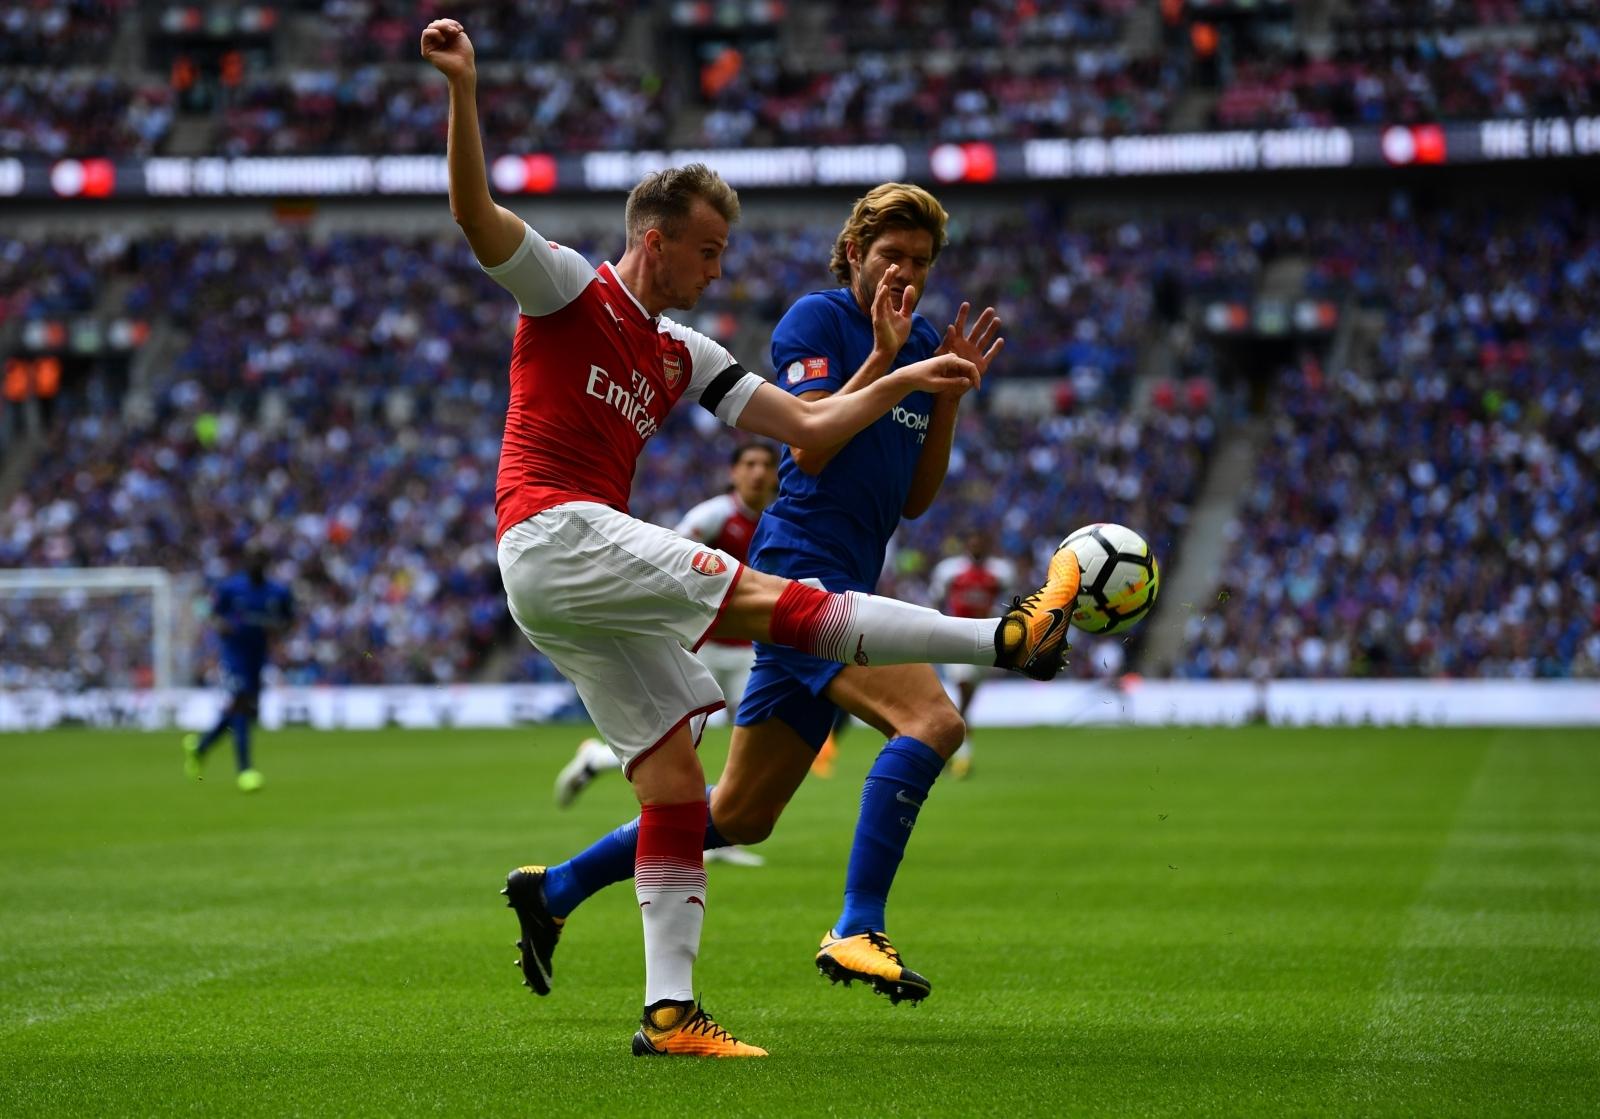 Arsenal 0-0 Chelsea: FA Community Shield - LIVE